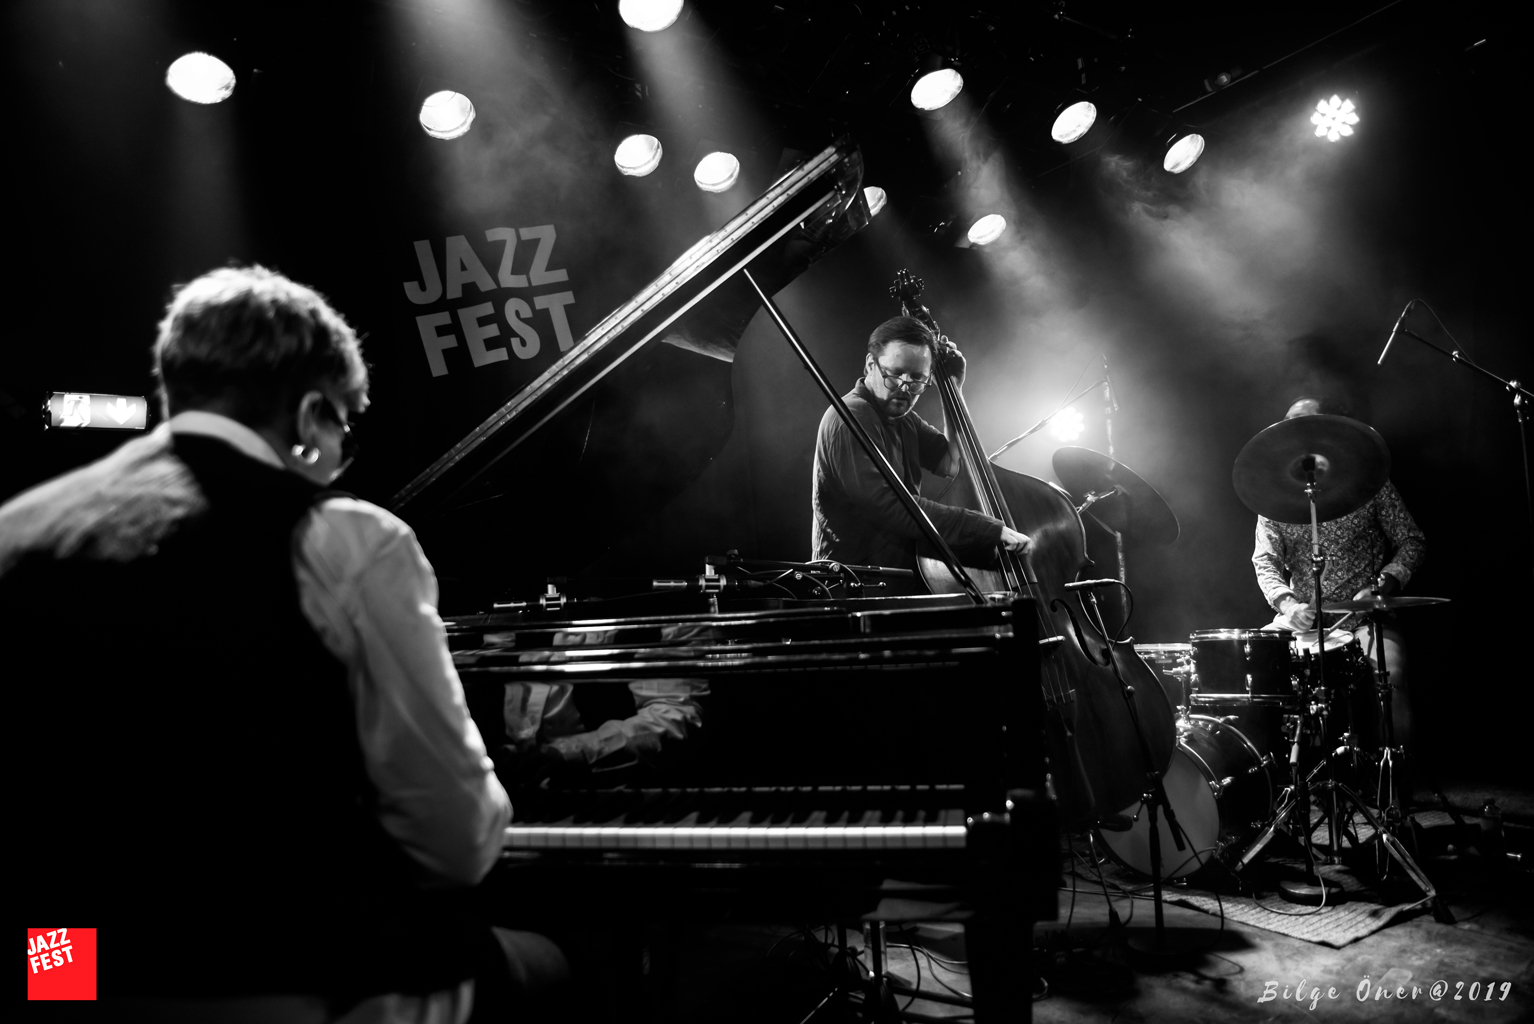 110519-Maria-Kannegaard-Trio-@-Studentsammfunnet-foto-Bilge-Öner-9.jpg